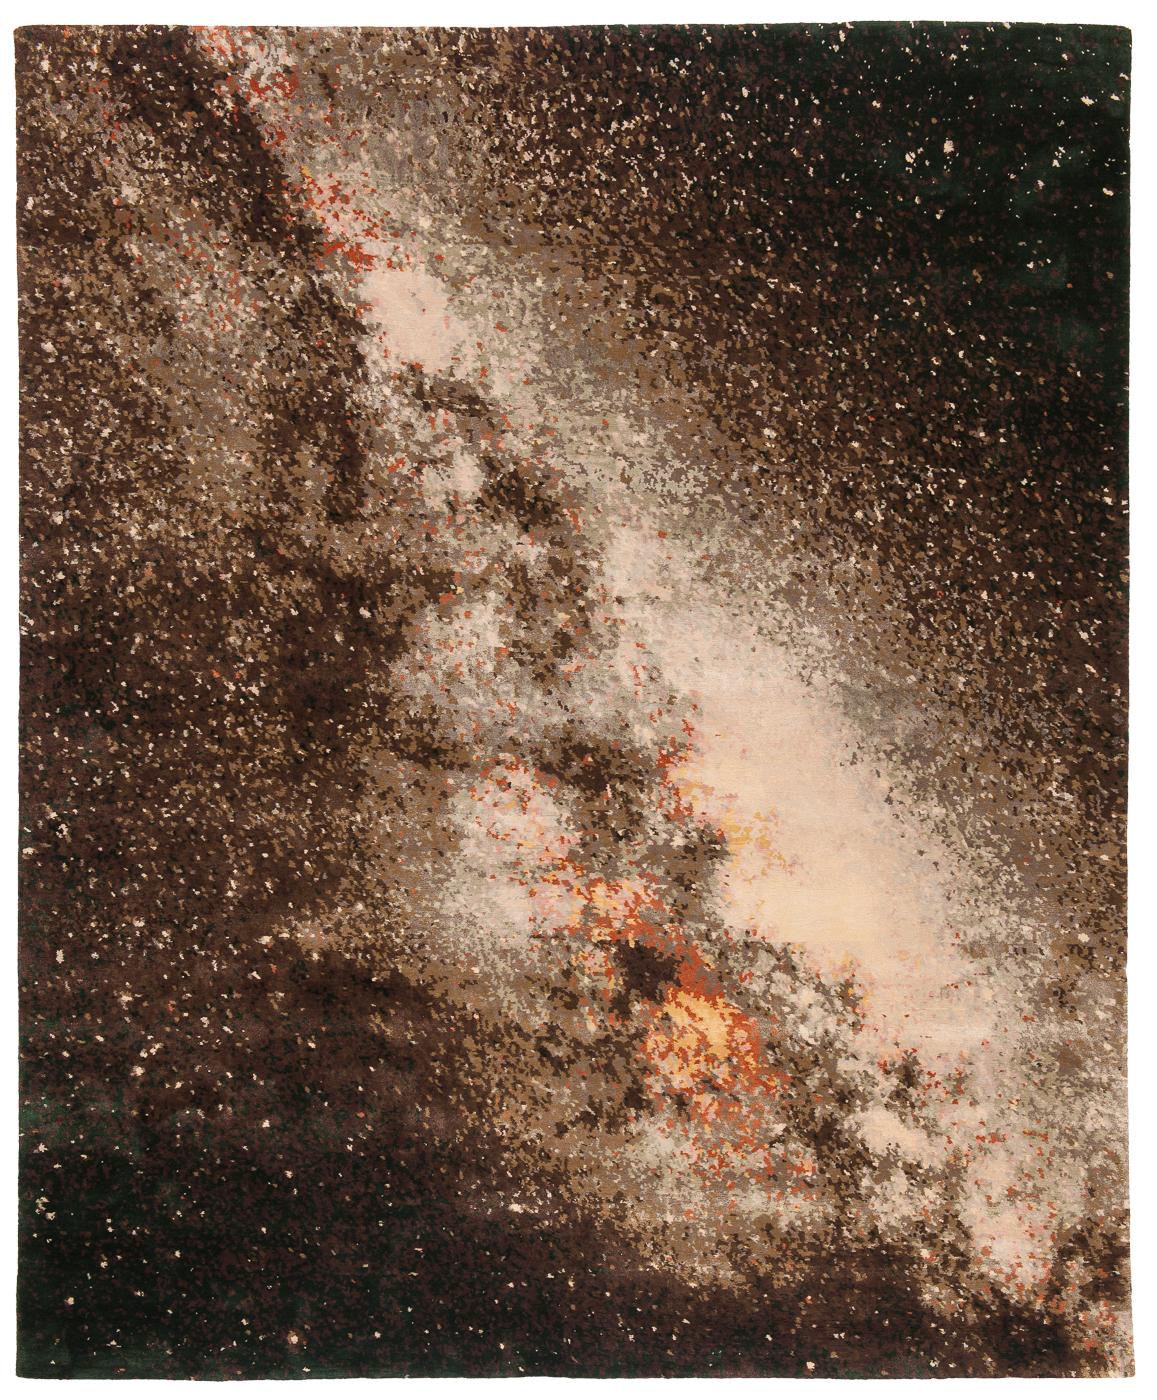 jankath_spacecrafted_carpet_13